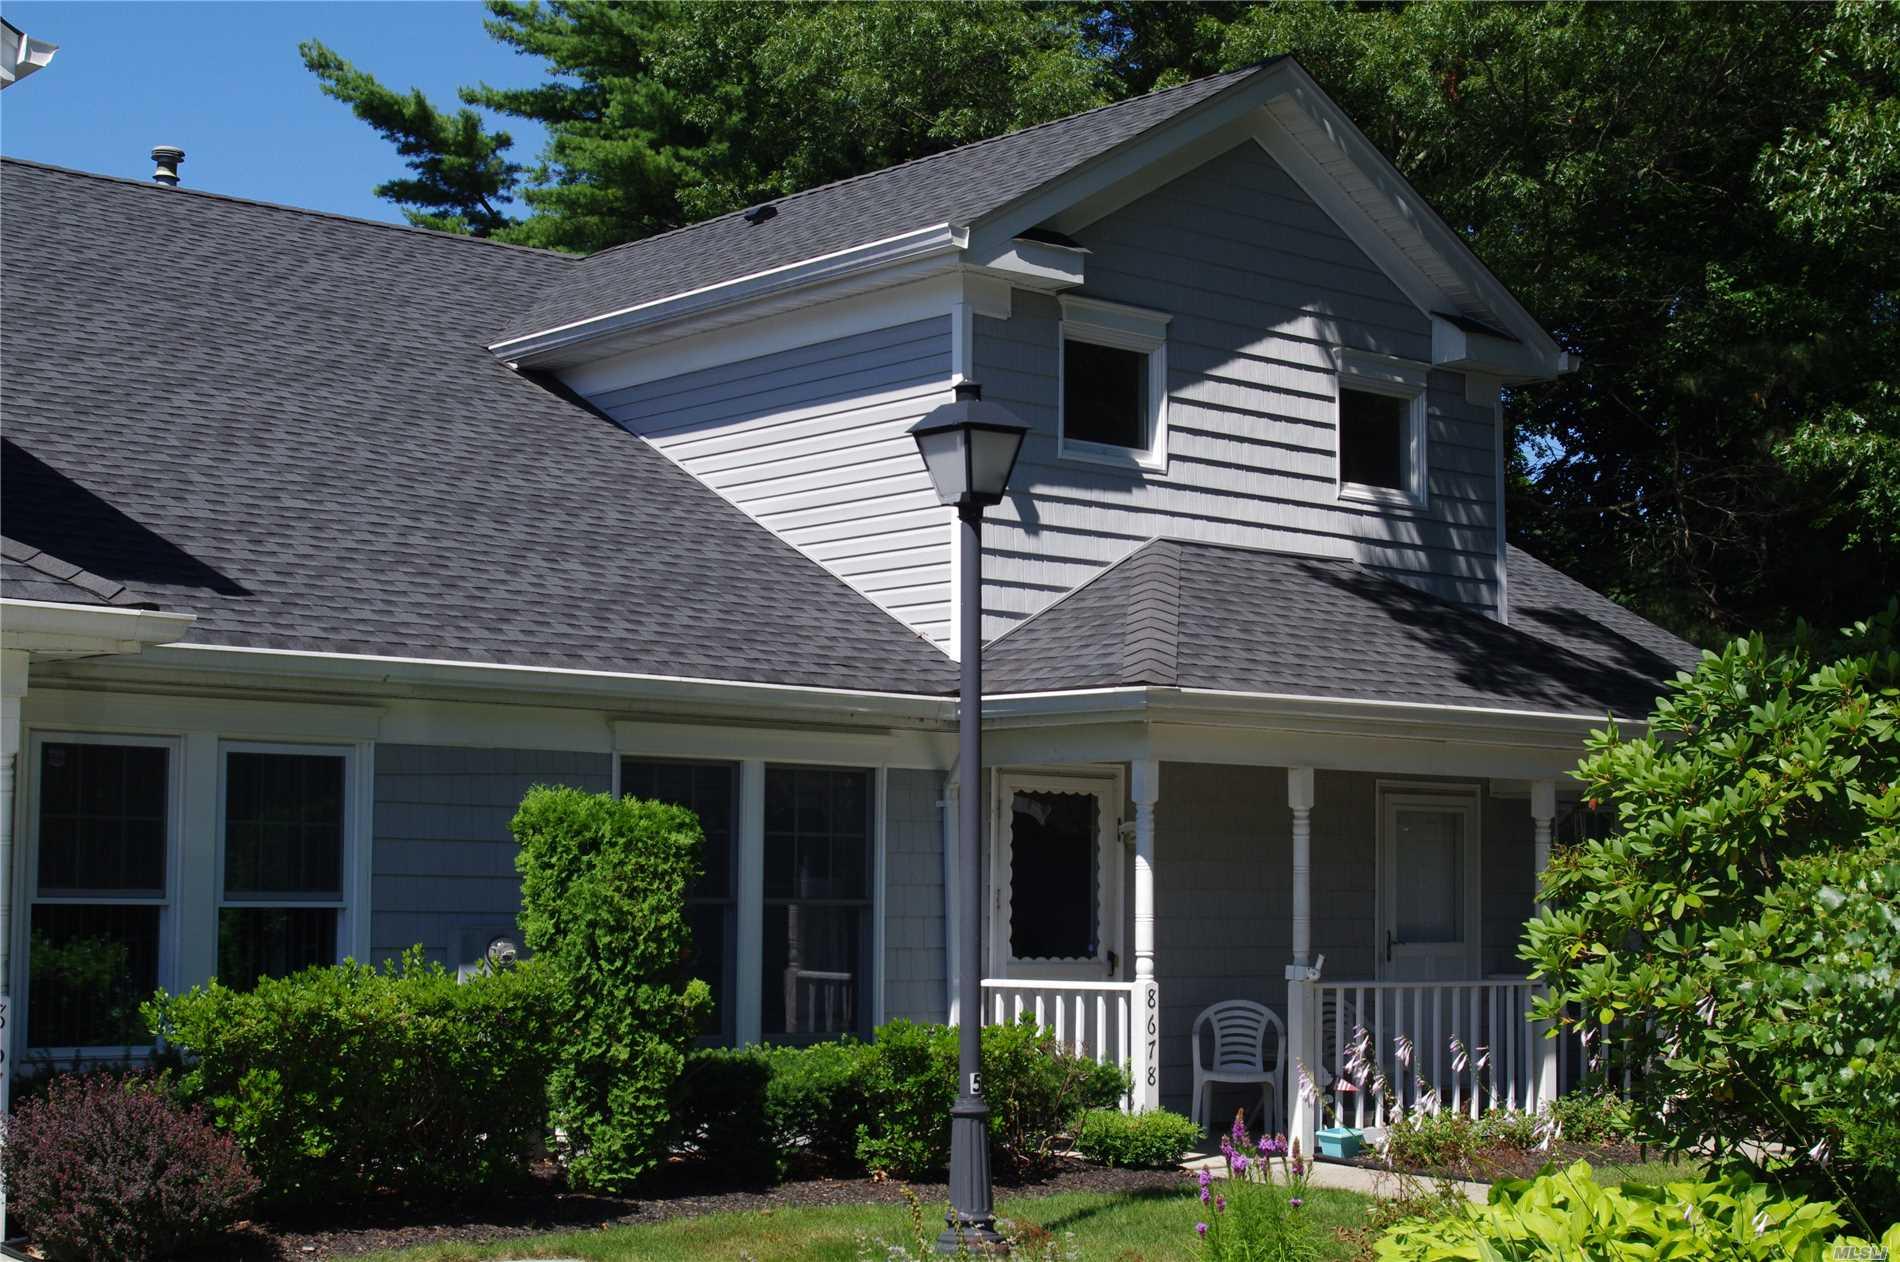 Property for sale at 867 Church St, Bohemia,  NY 11716